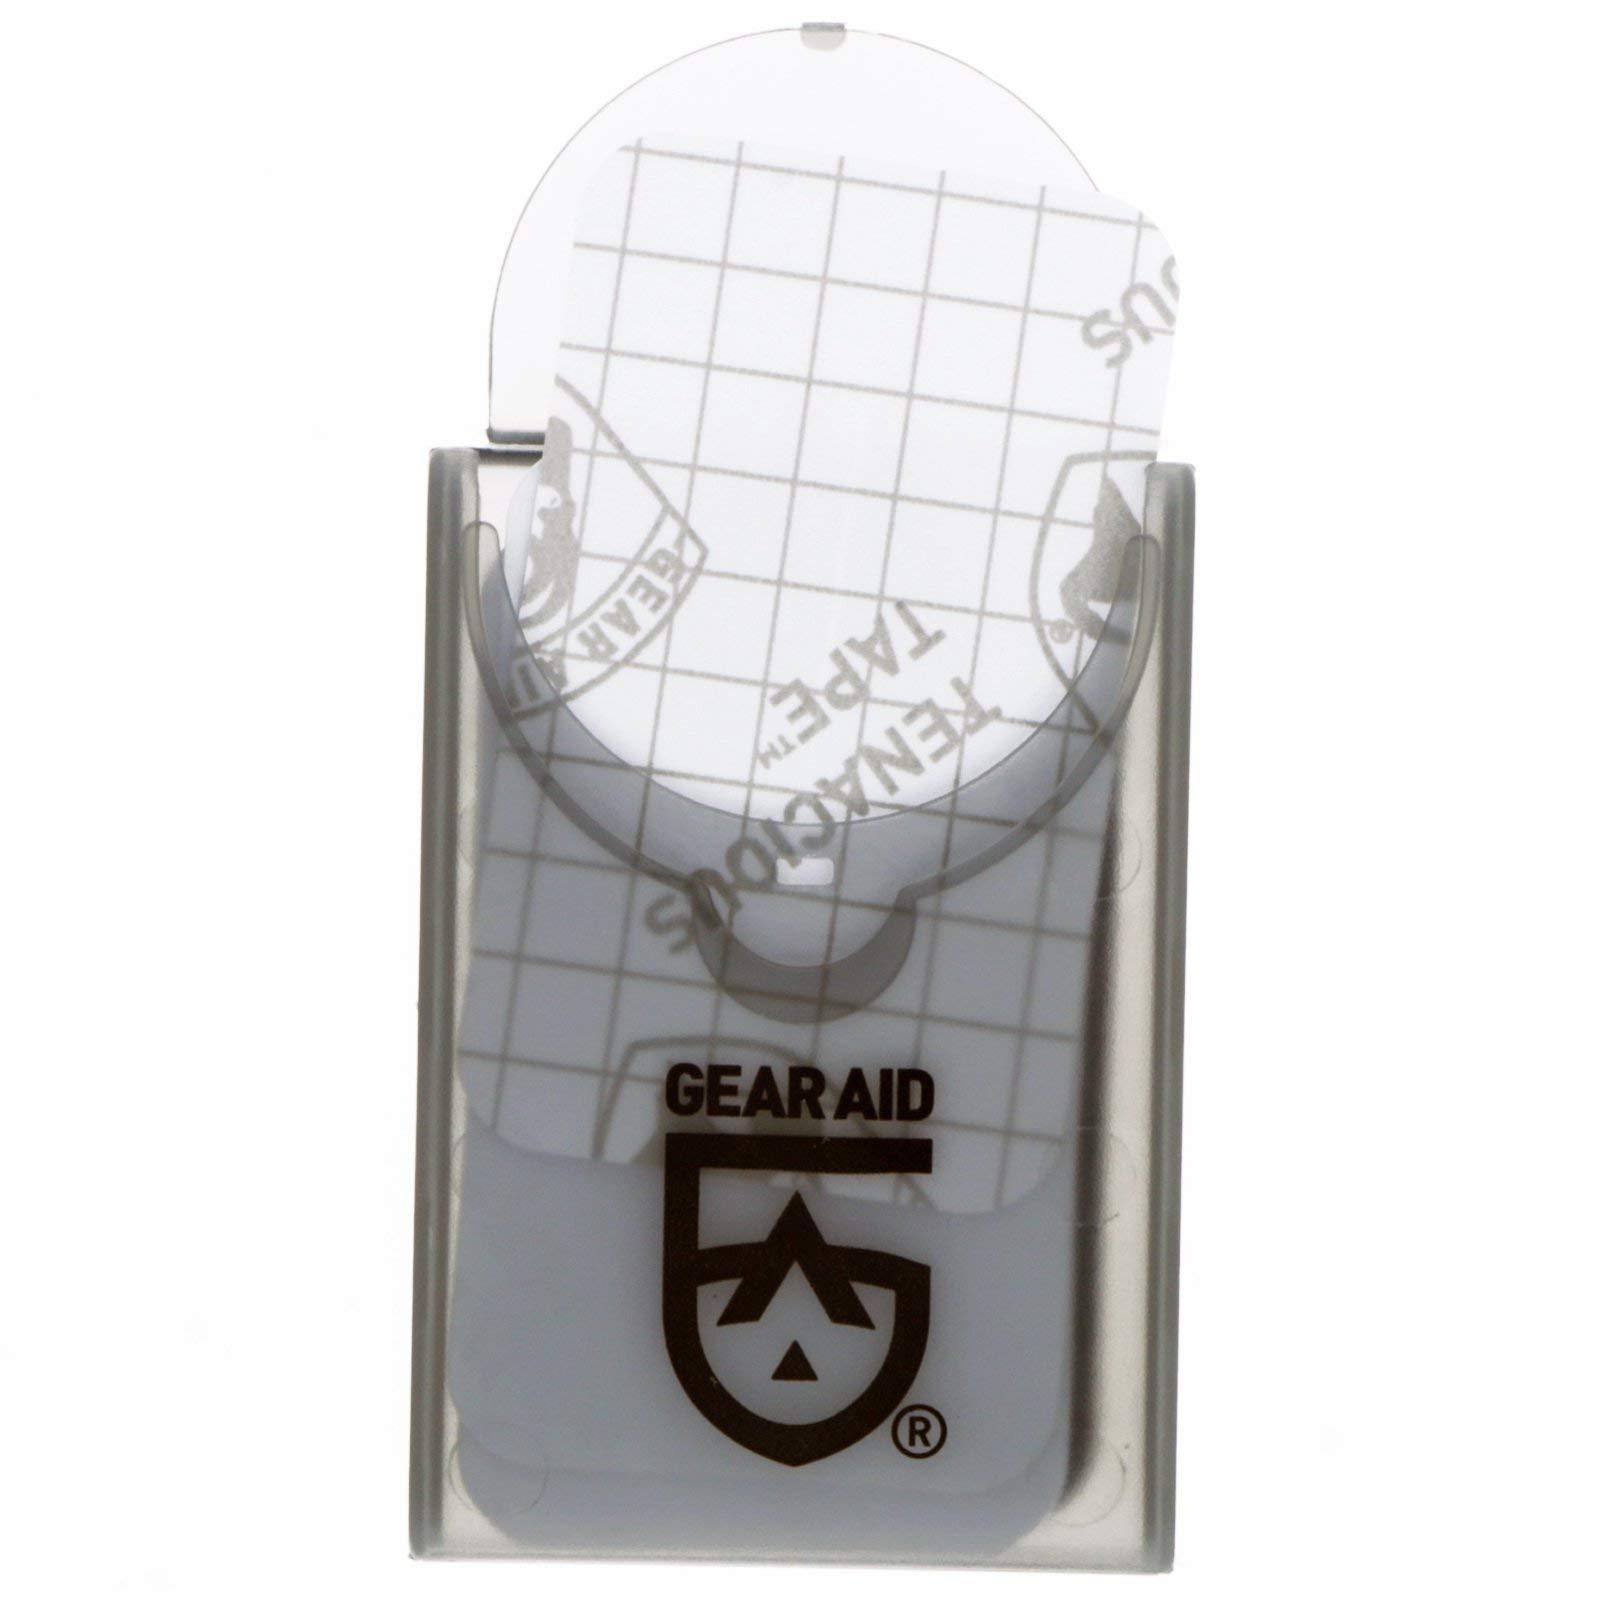 Gear Aid Tenacious Tape Mini Repair Patches, Black Only